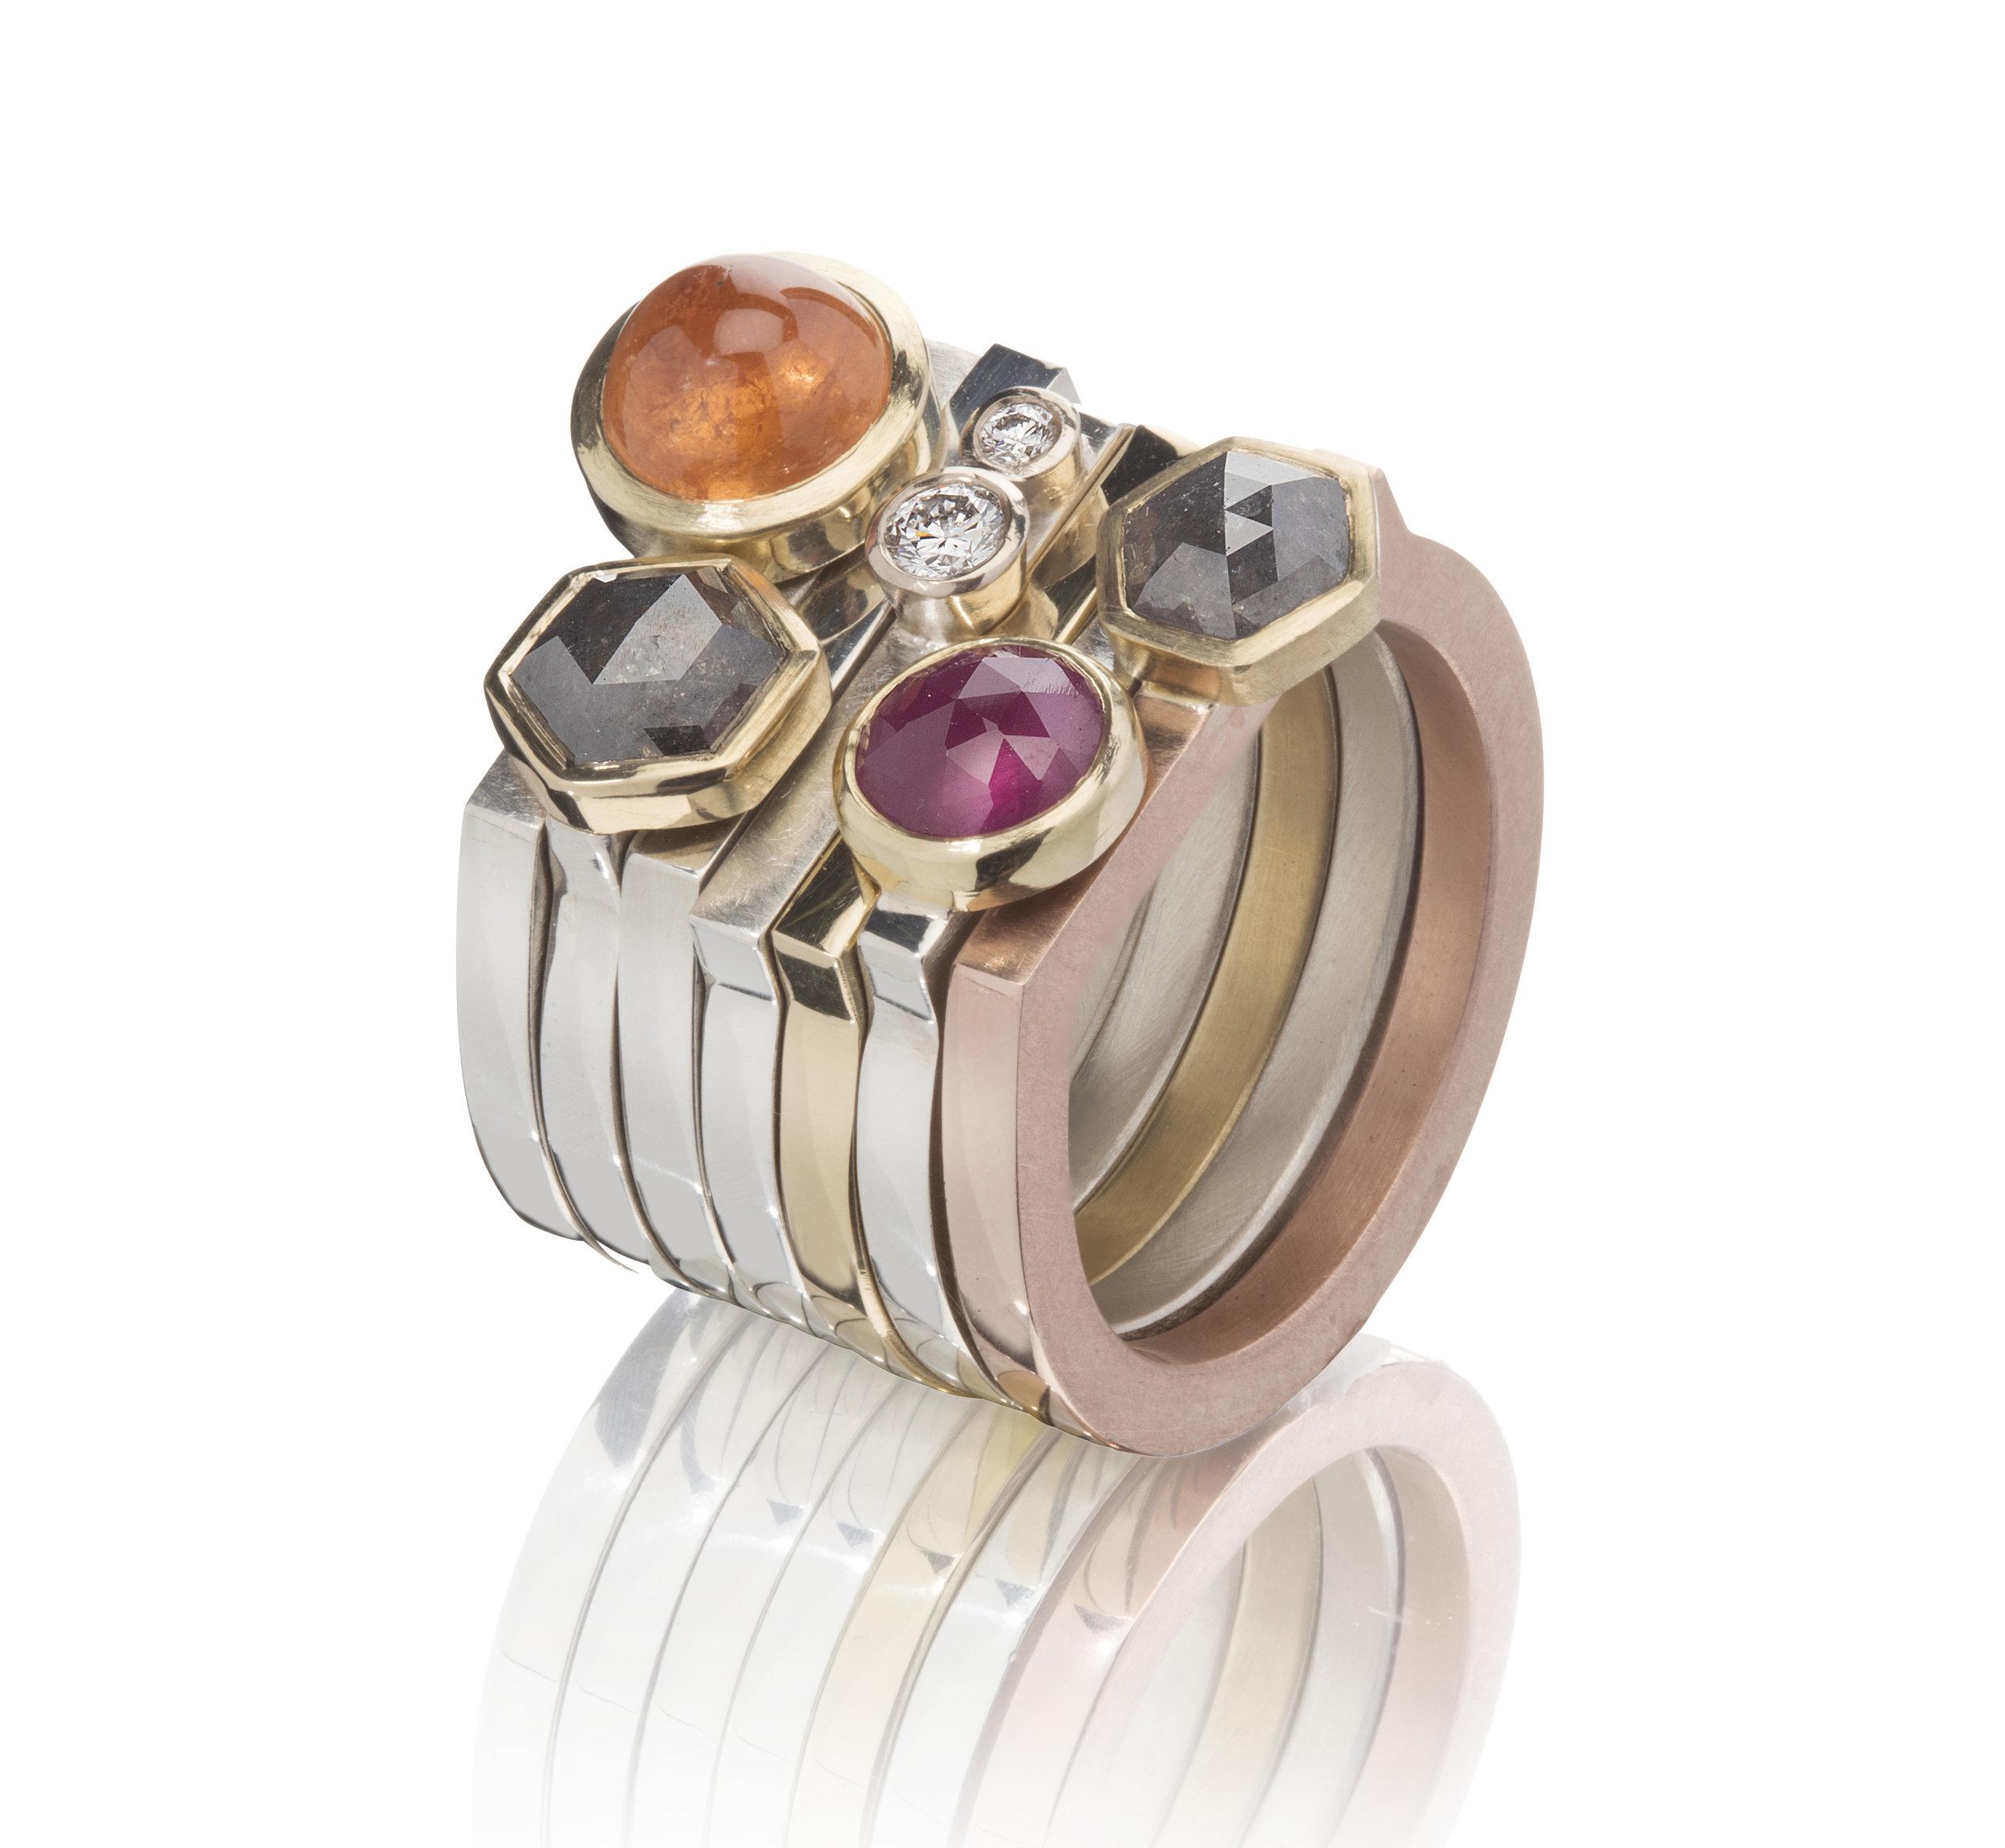 Diamond, ruby, mandarin garnet notch rings